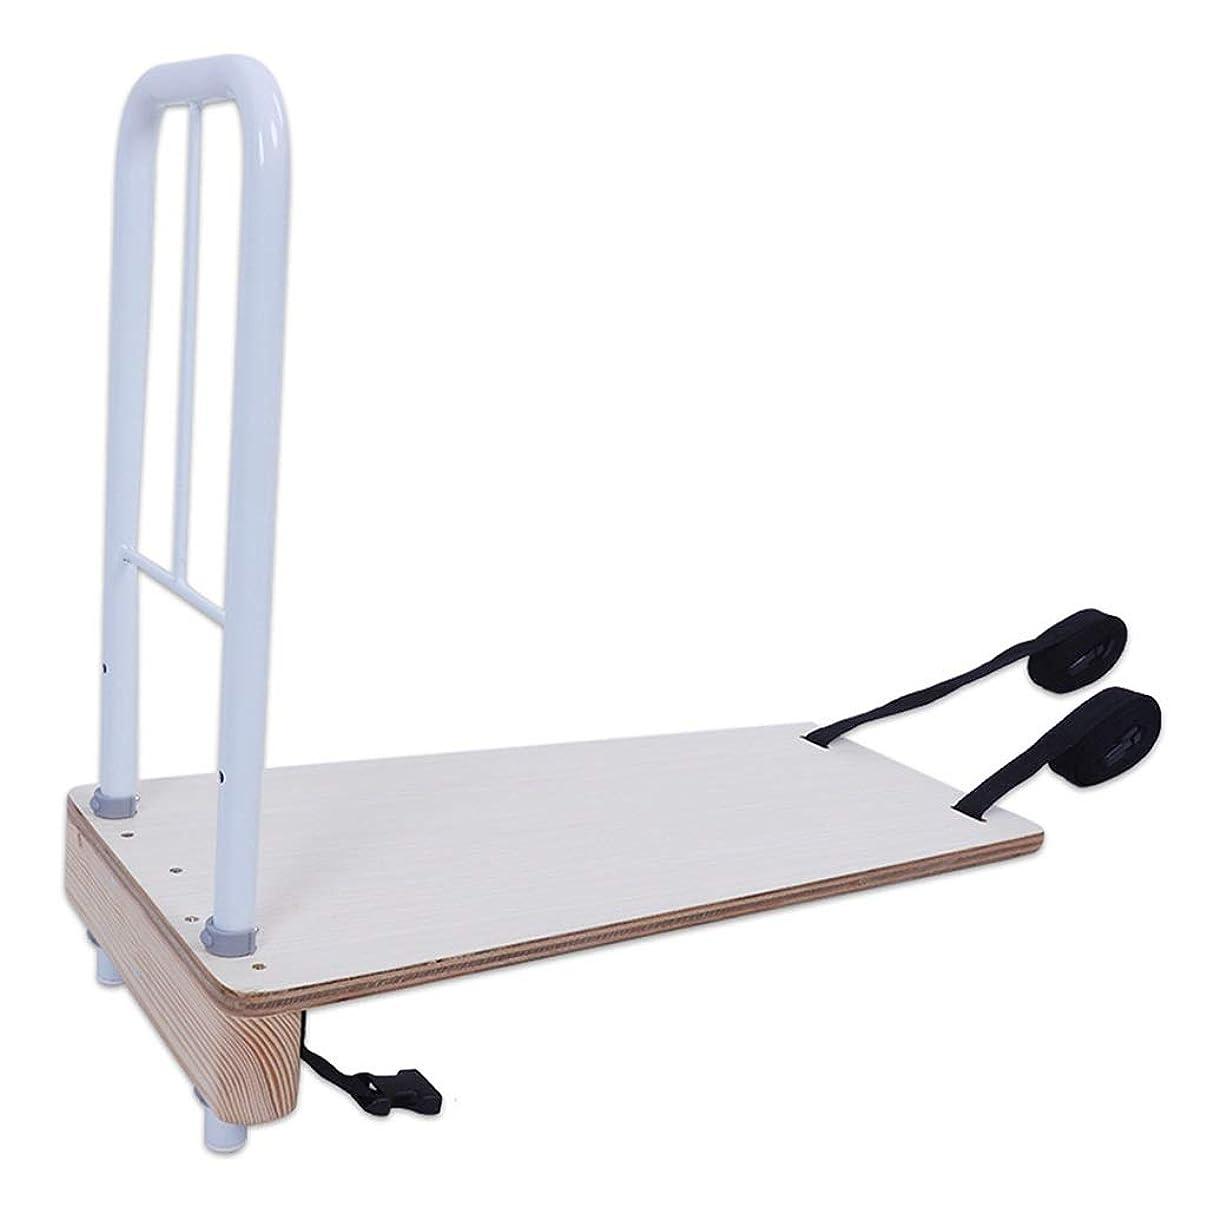 WCX ポータブルシニアバリア スチールチューブベッド落下防止レール 障害者用ベッド手すり,広いベッド1.5メートル用 (Size : 60x37.45x31.5cm)